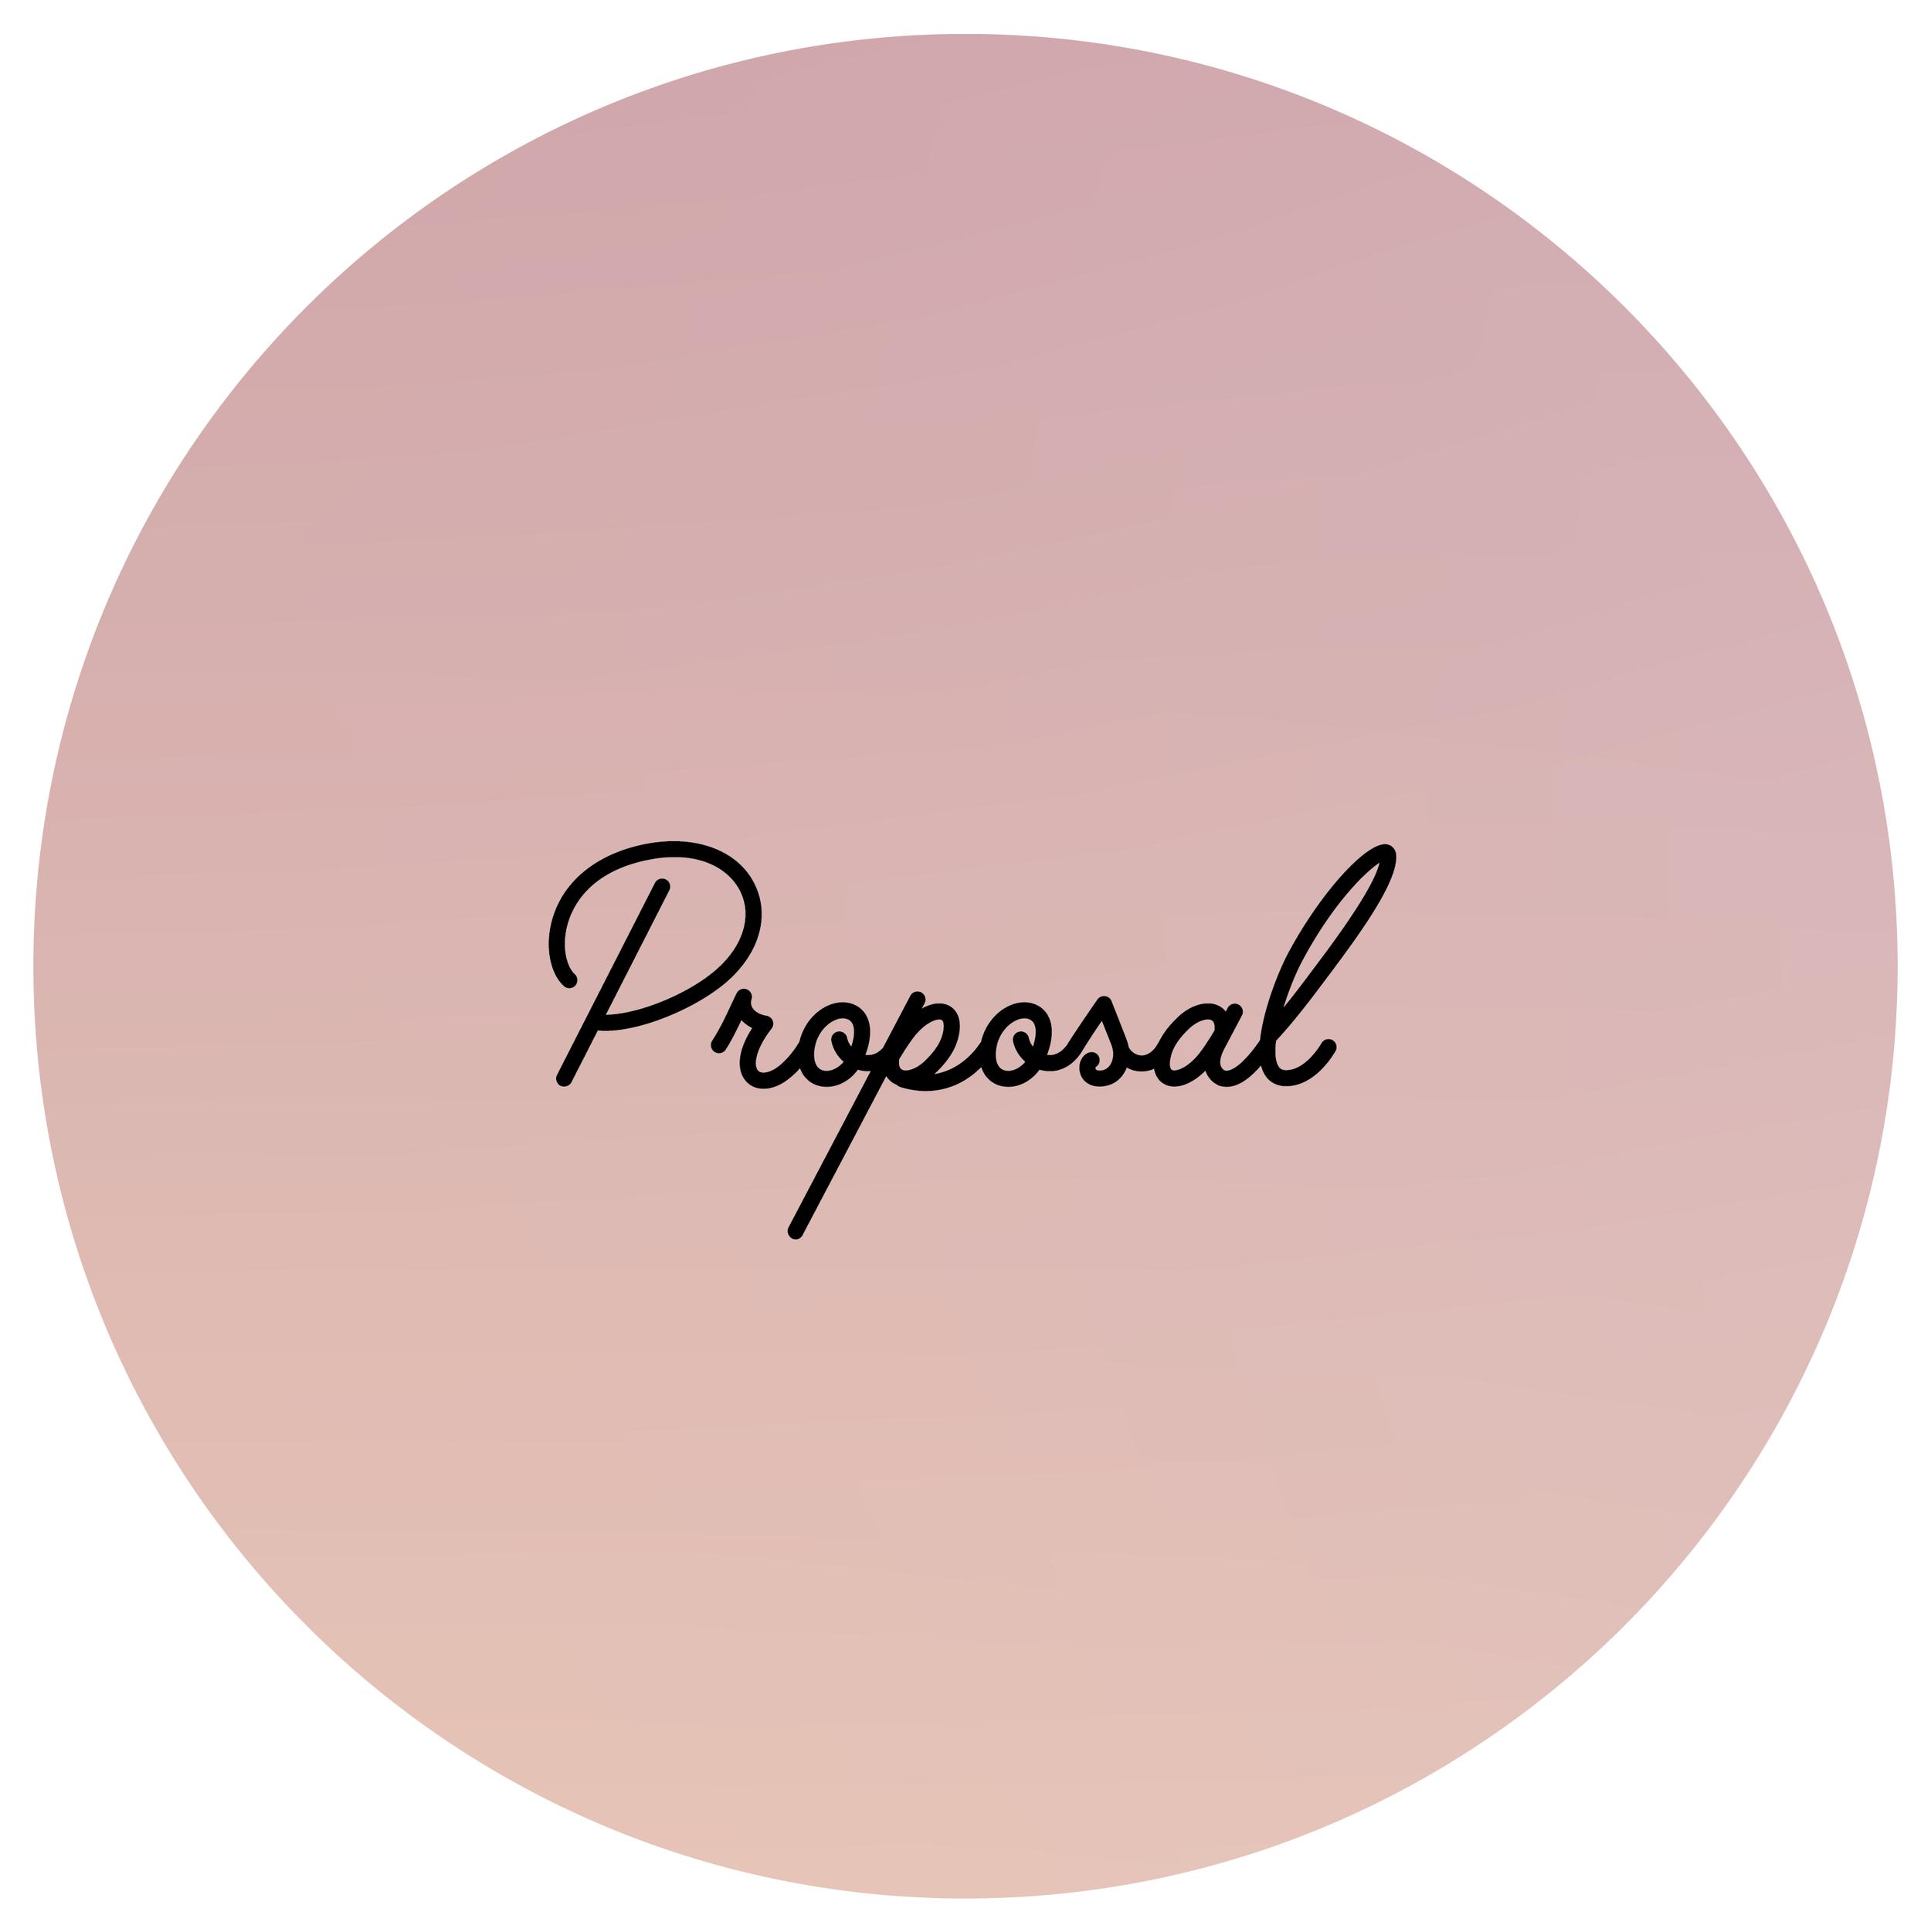 Process_circles-01.png